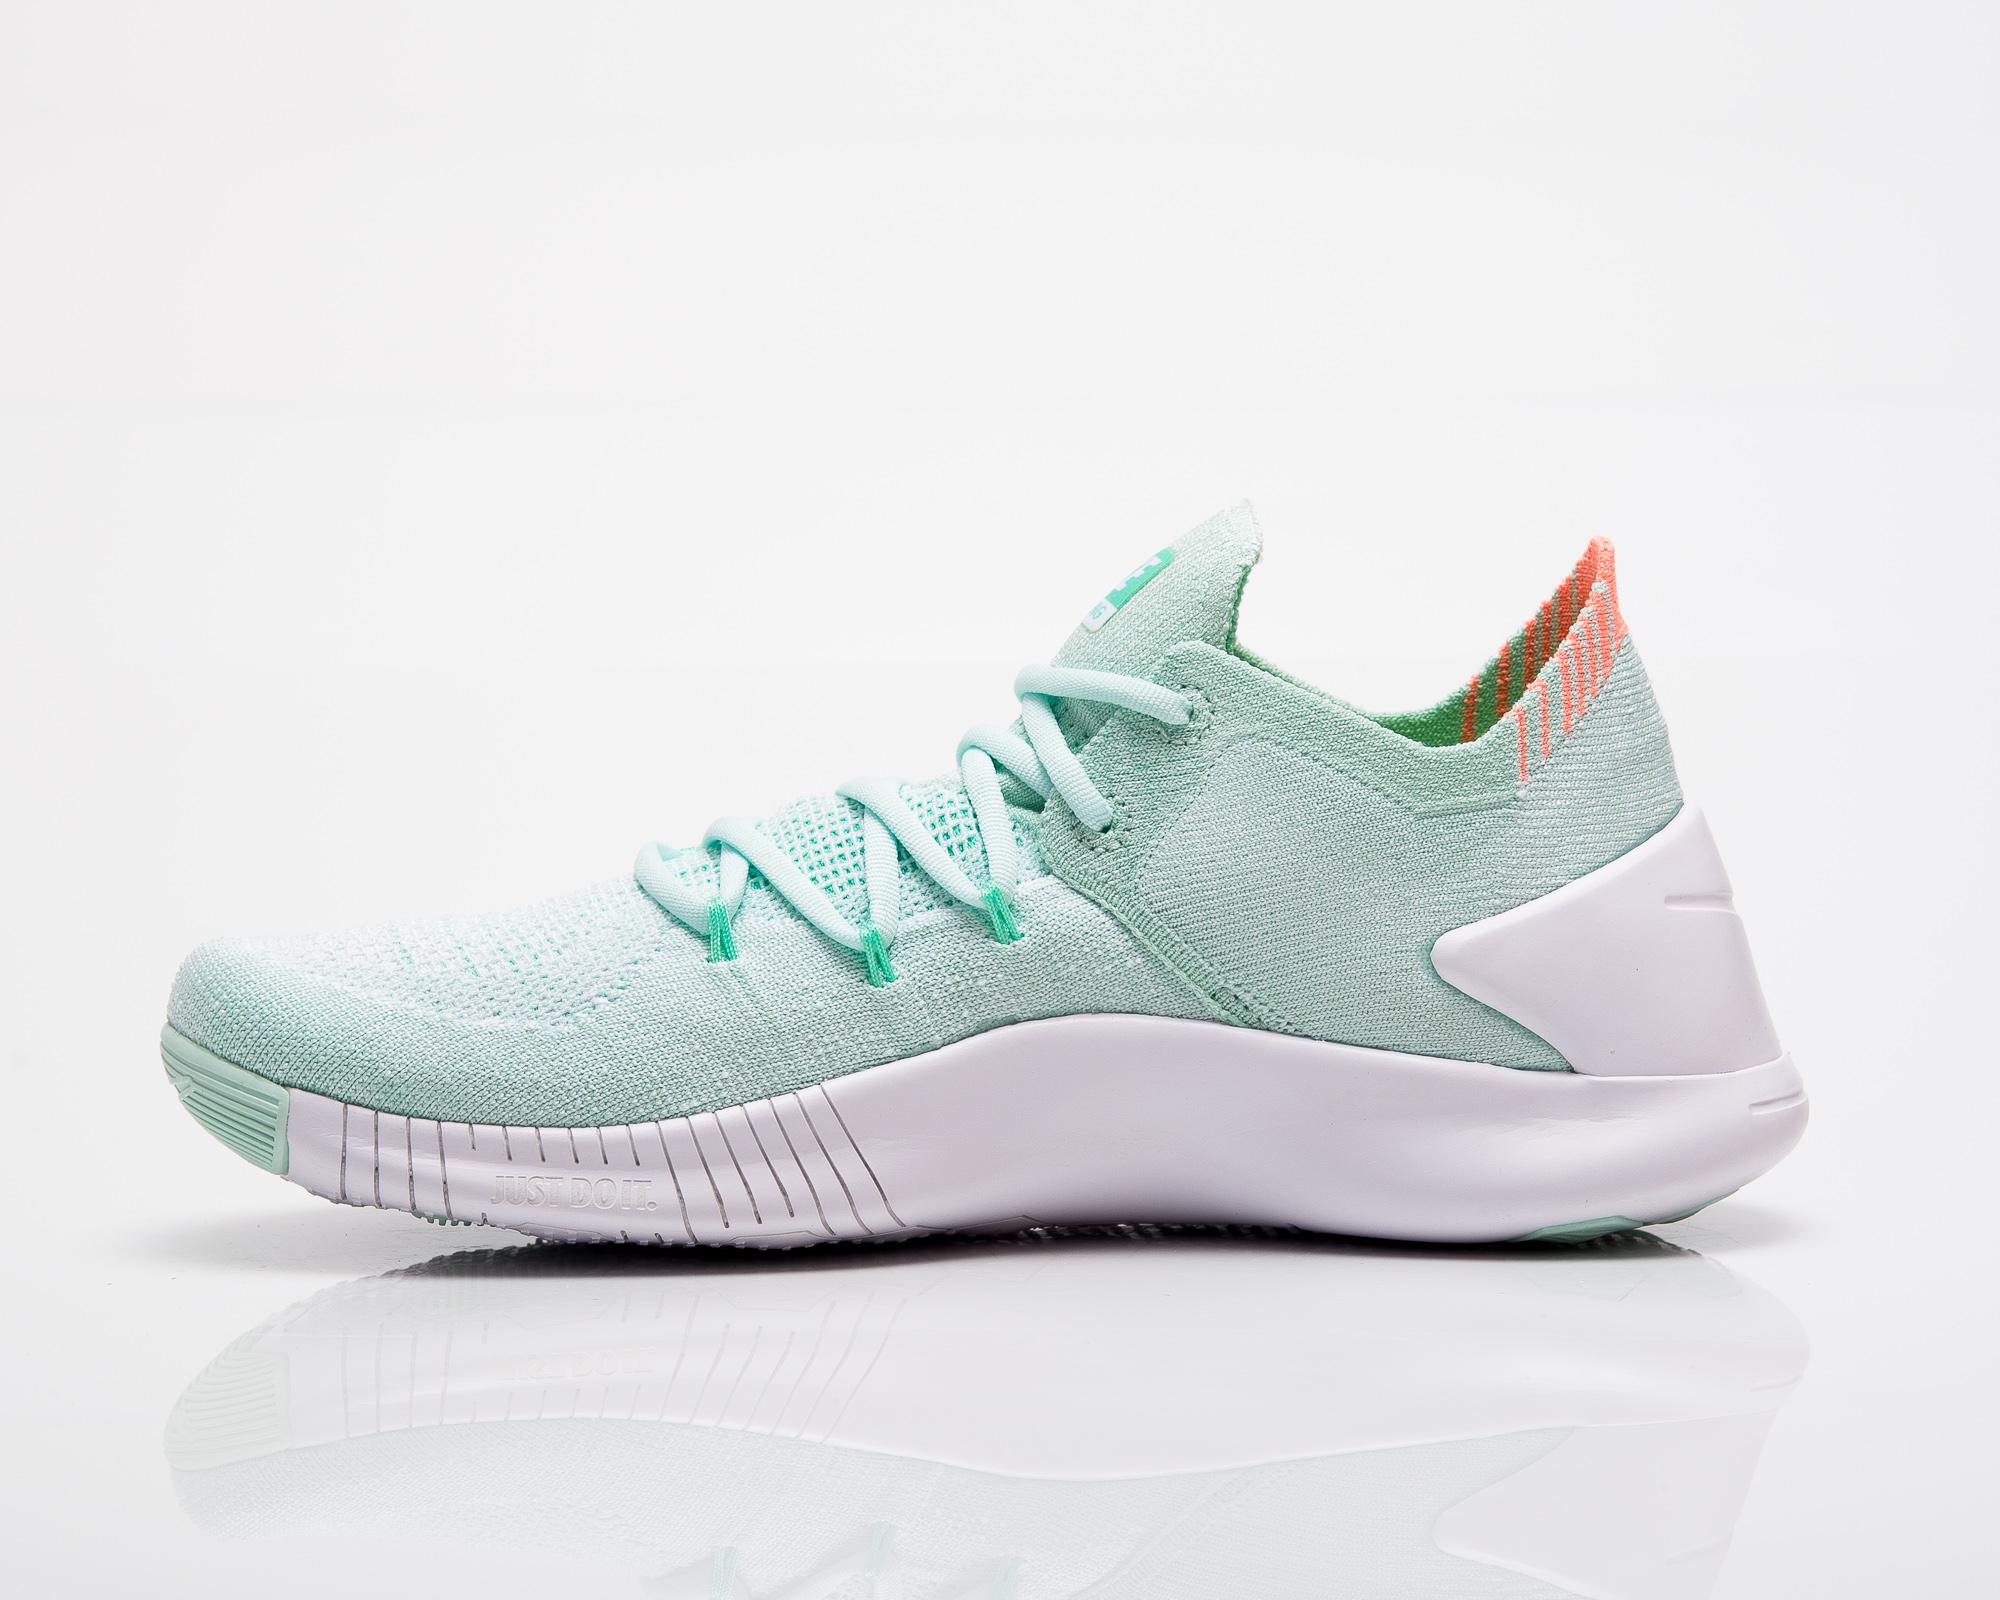 a8a4fa15b1da9 Nike Wmns Free TR Flyknit 3 - Shoes Training - Sporting goods